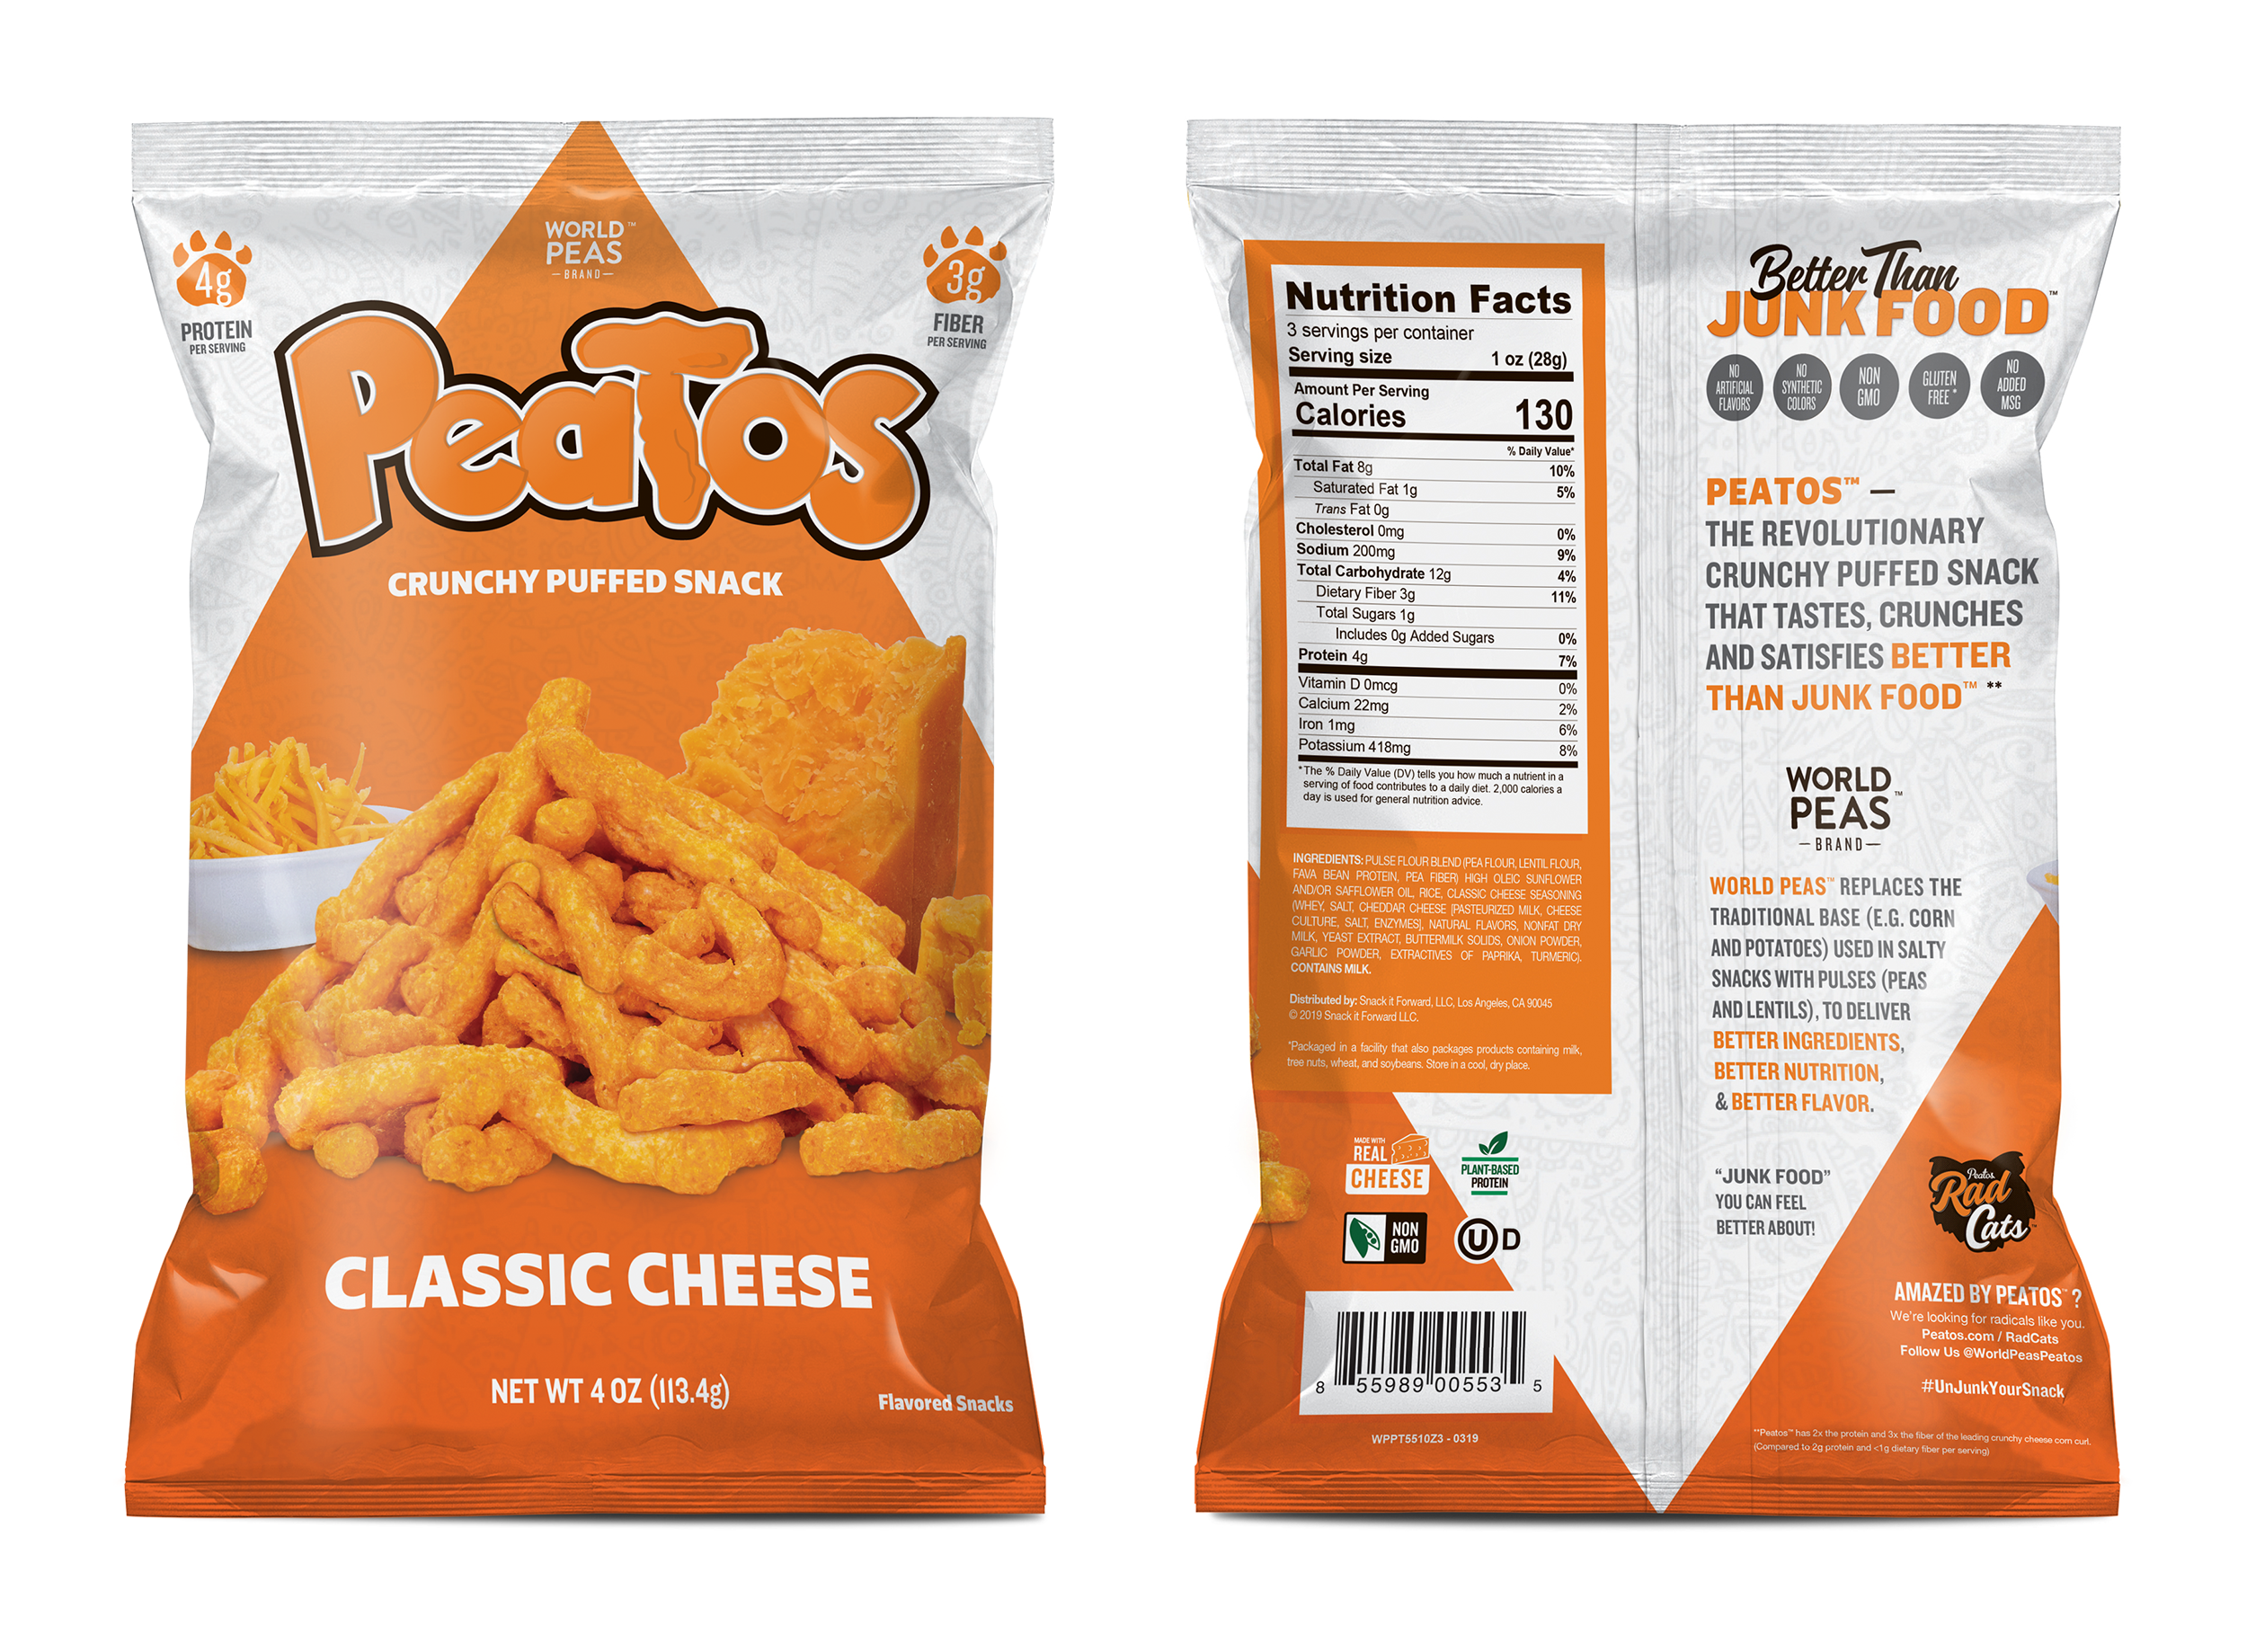 PEATOS Classic Cheese bag packaging design explorations. Illustrator & Photoshop CC.